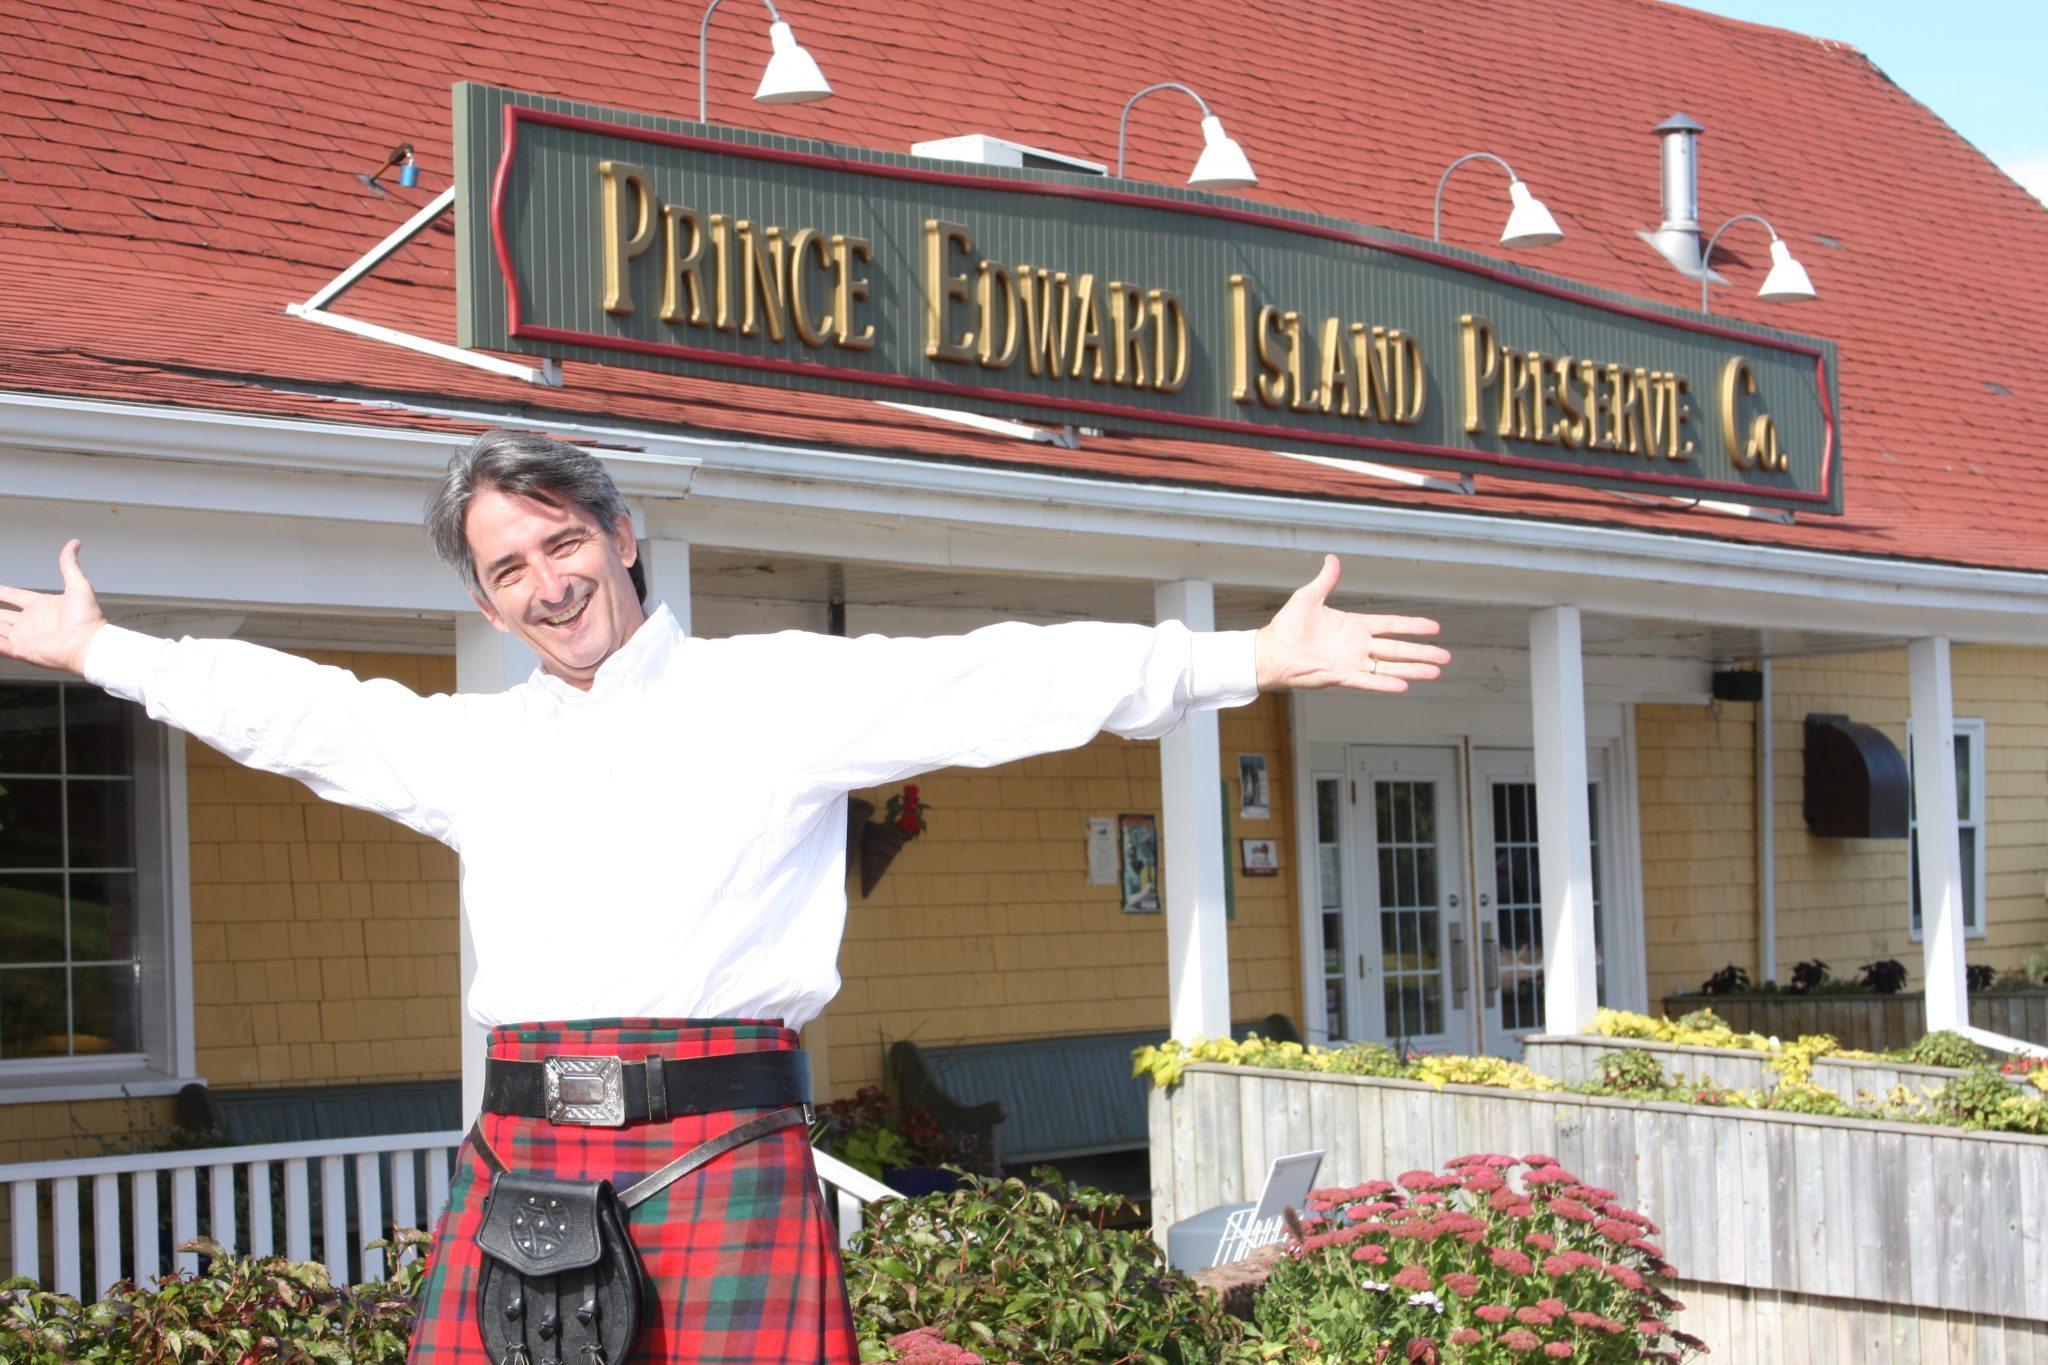 Prince Edward Island Preserve Co.